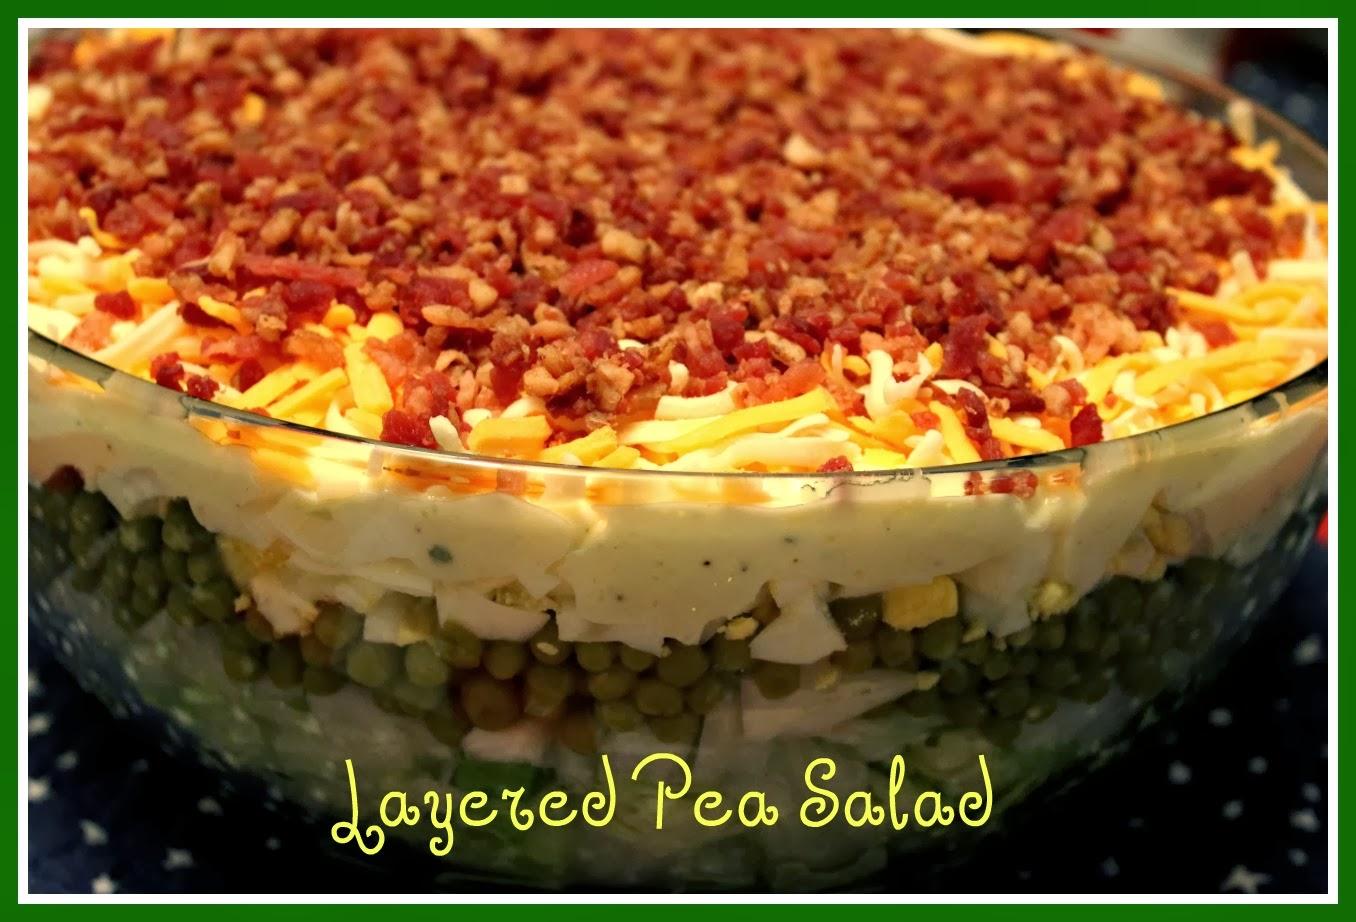 Layered Pea Salad!